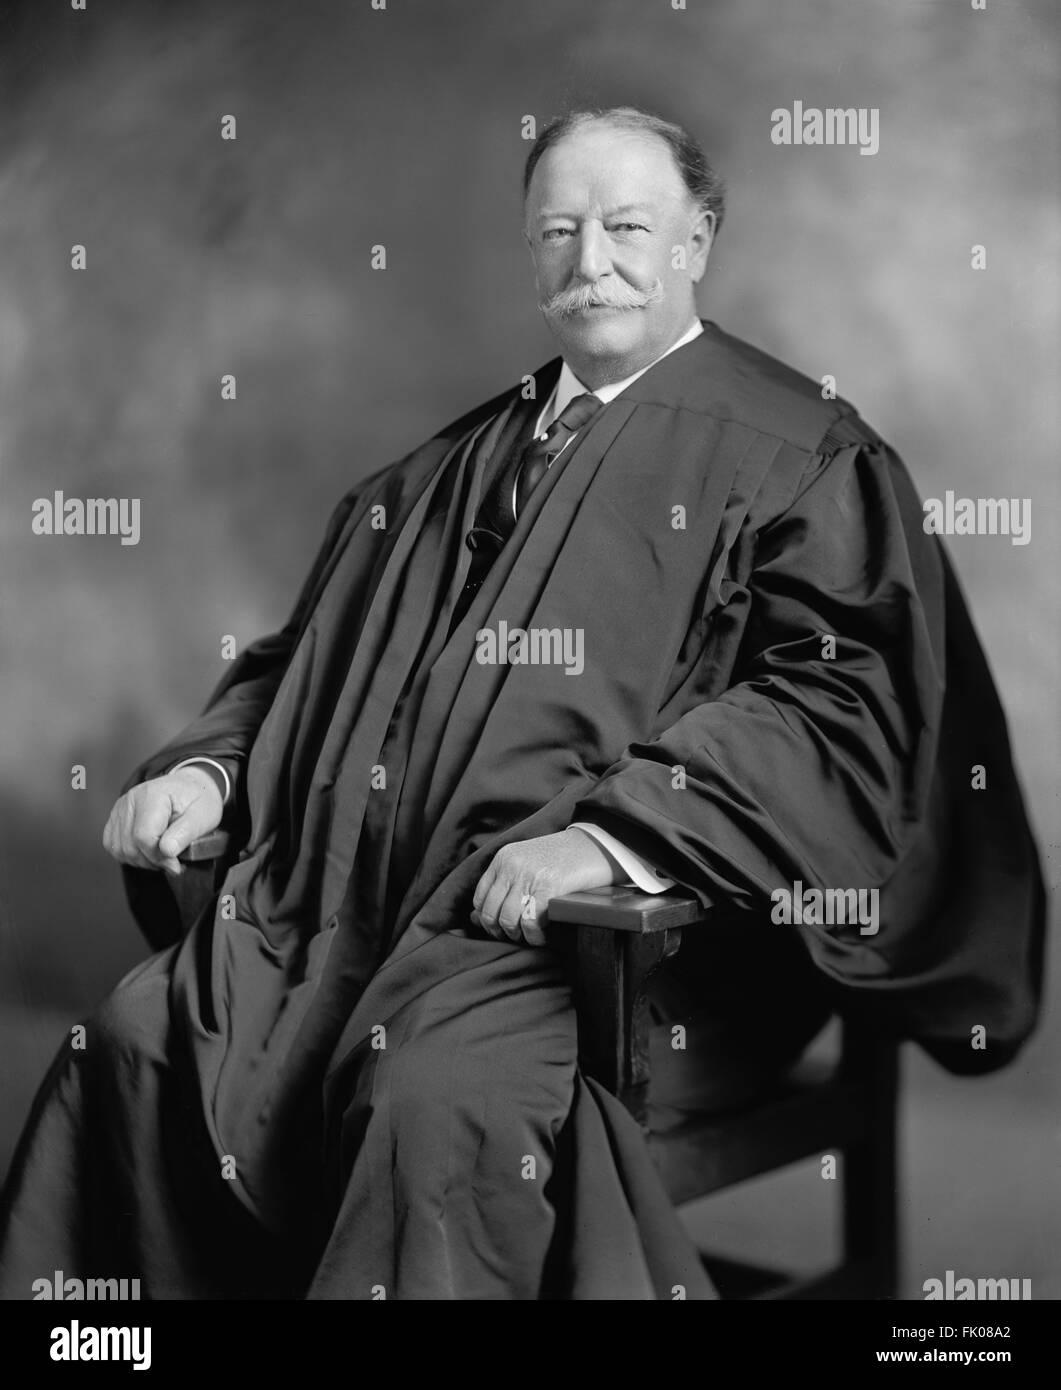 Former U.S. President William Howard Taft as Chief  of Supreme Court, Portrait, circa 1920's.jpg - Stock Image